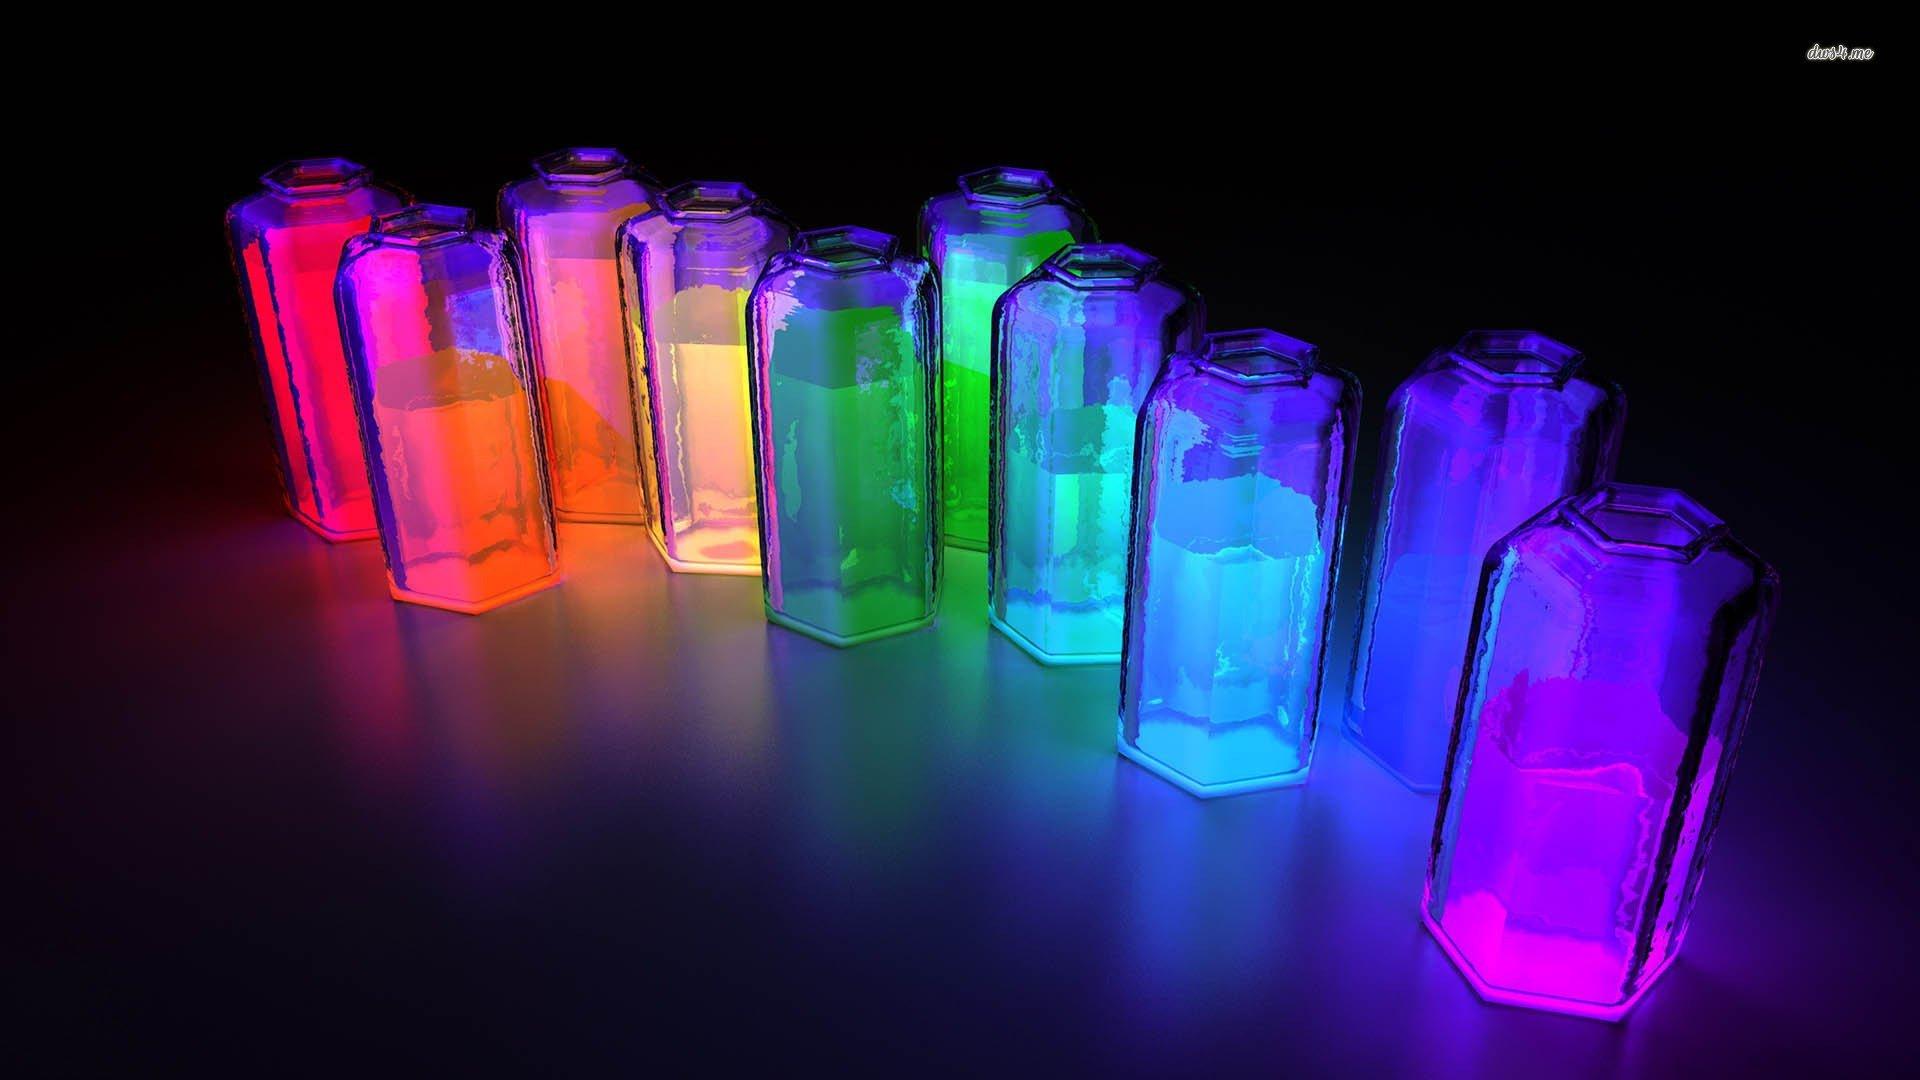 Fluorescence